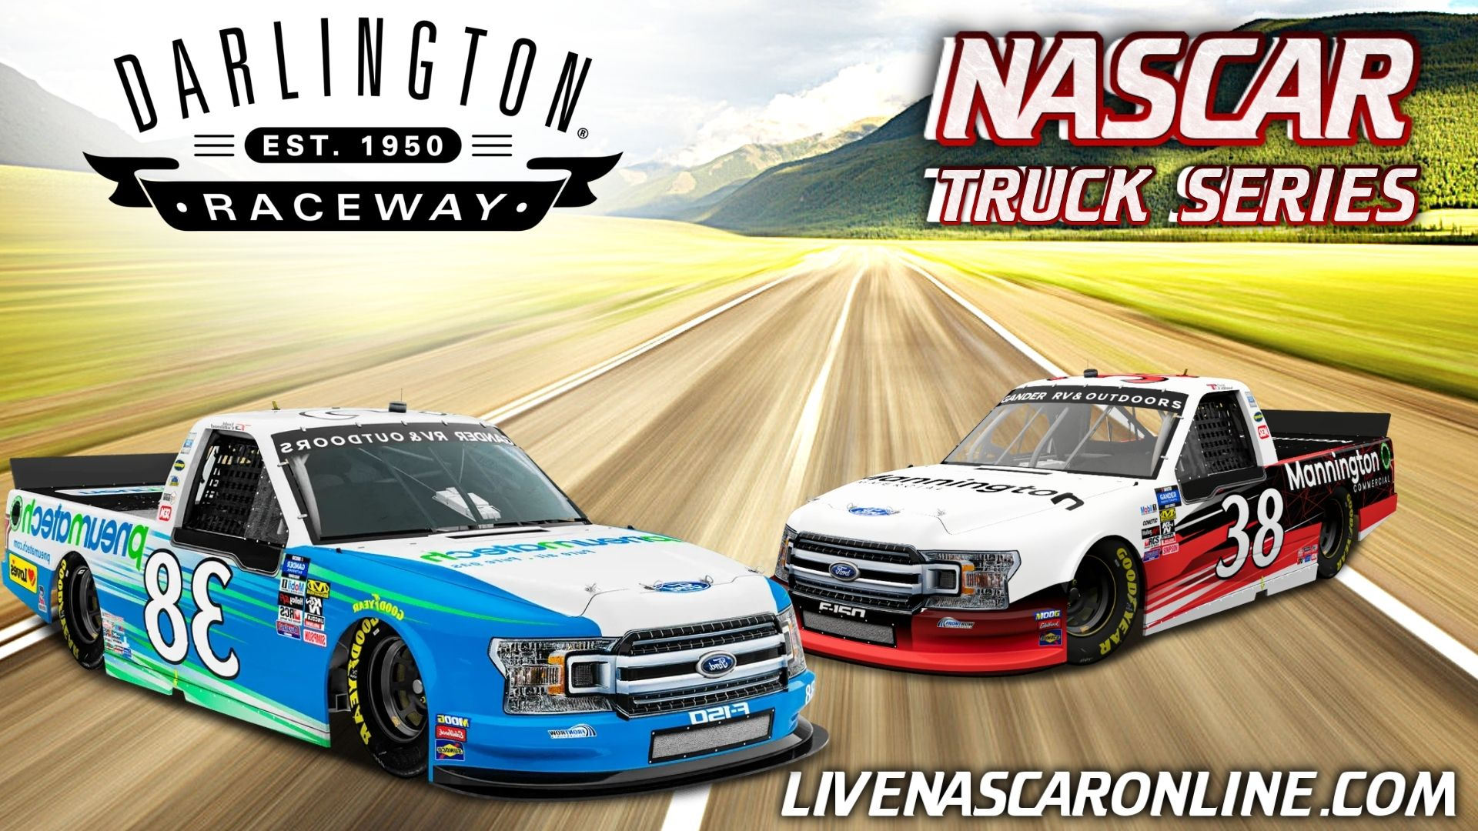 NASCAR Truck Race at Darlington Live Stream 2021